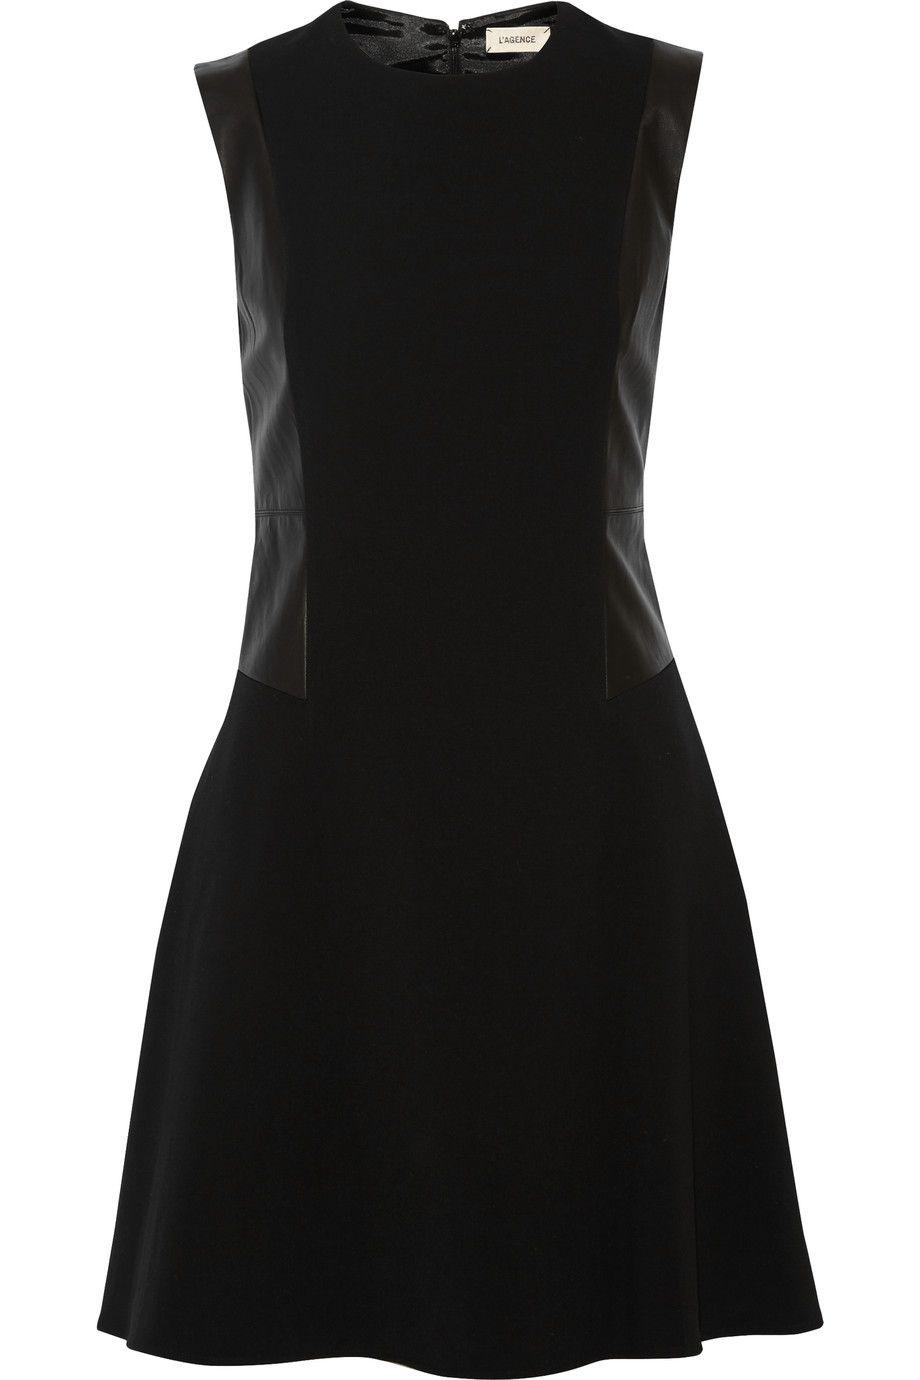 L'AGENCE Stephanie leather-paneled crepe mini dress. #lagence #cloth #dress